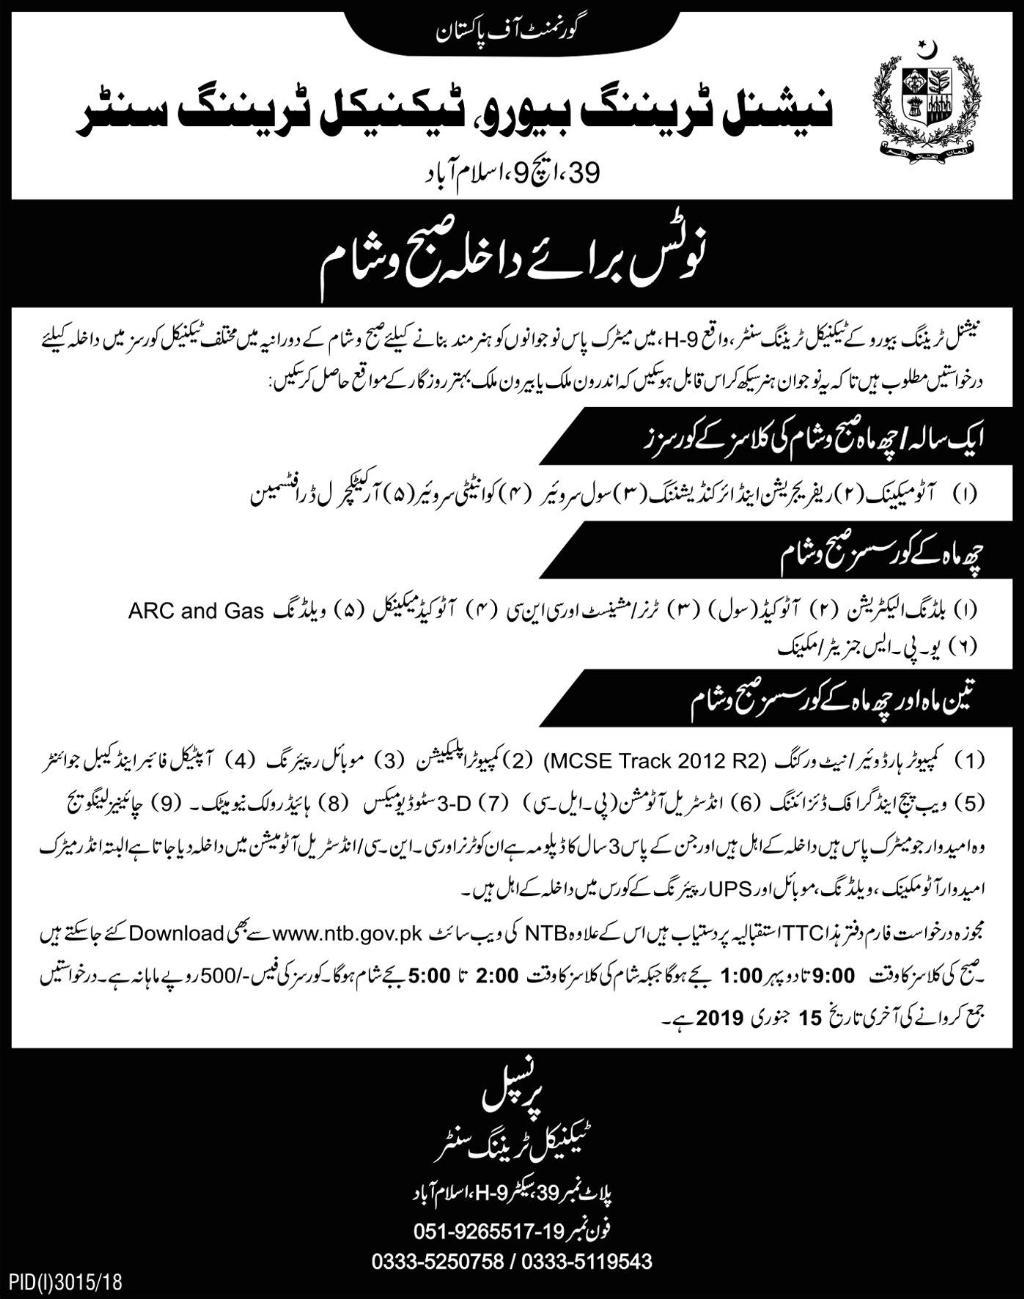 National Training Bureau Admission 2019 NTB Islamabad Application Form